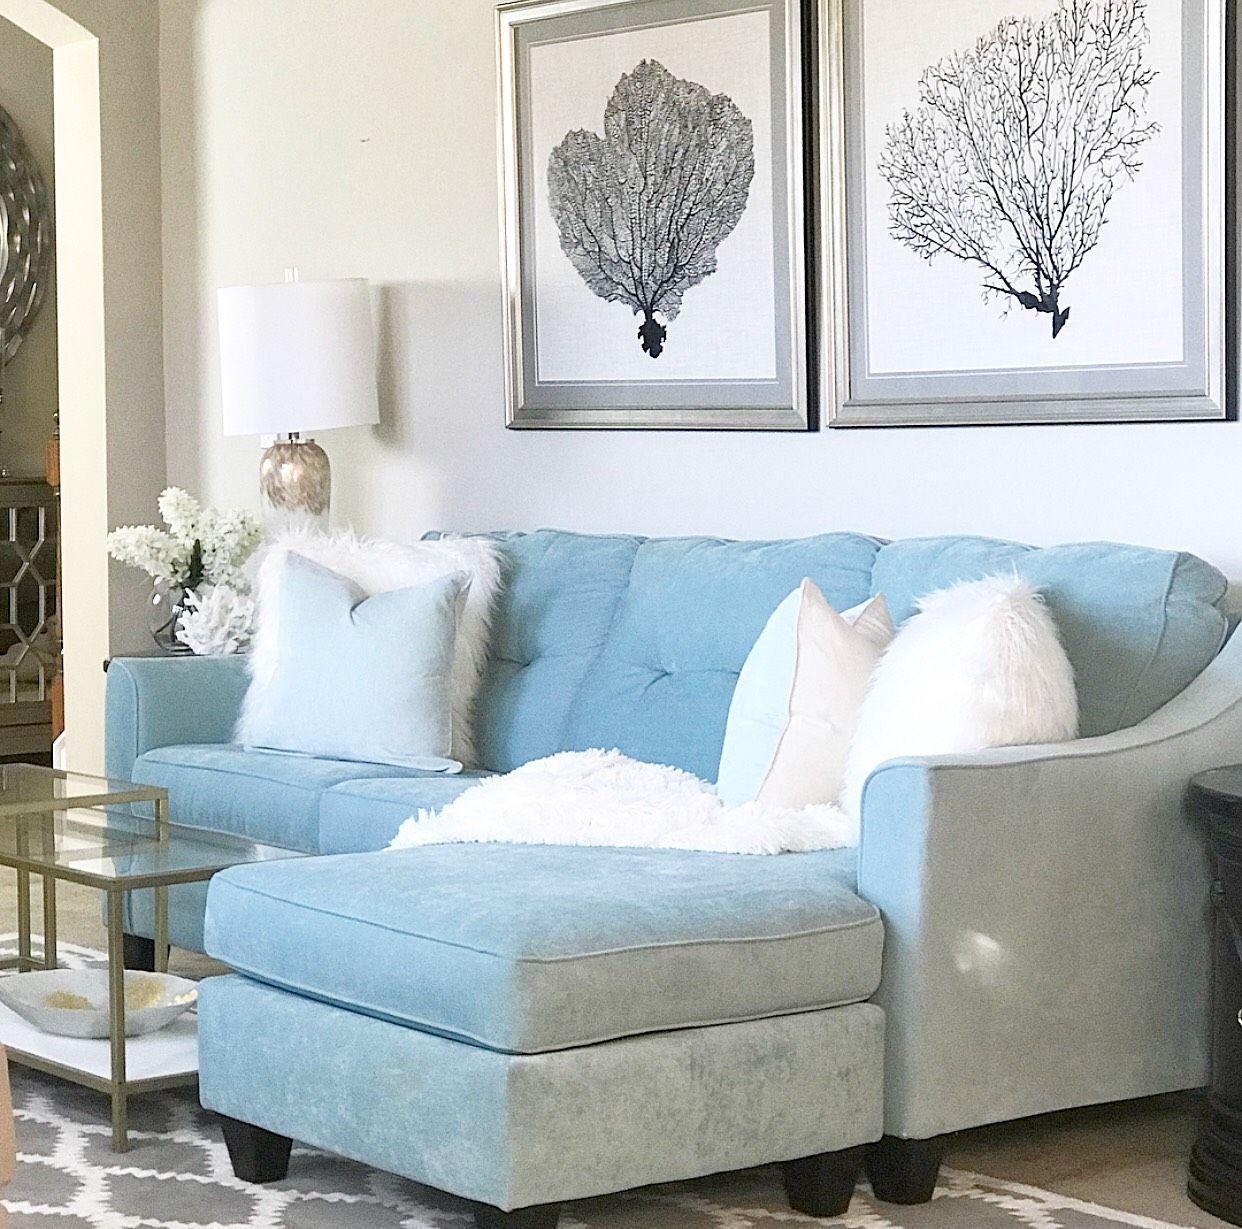 Pin On Family Room Ideas Sea living room decoration